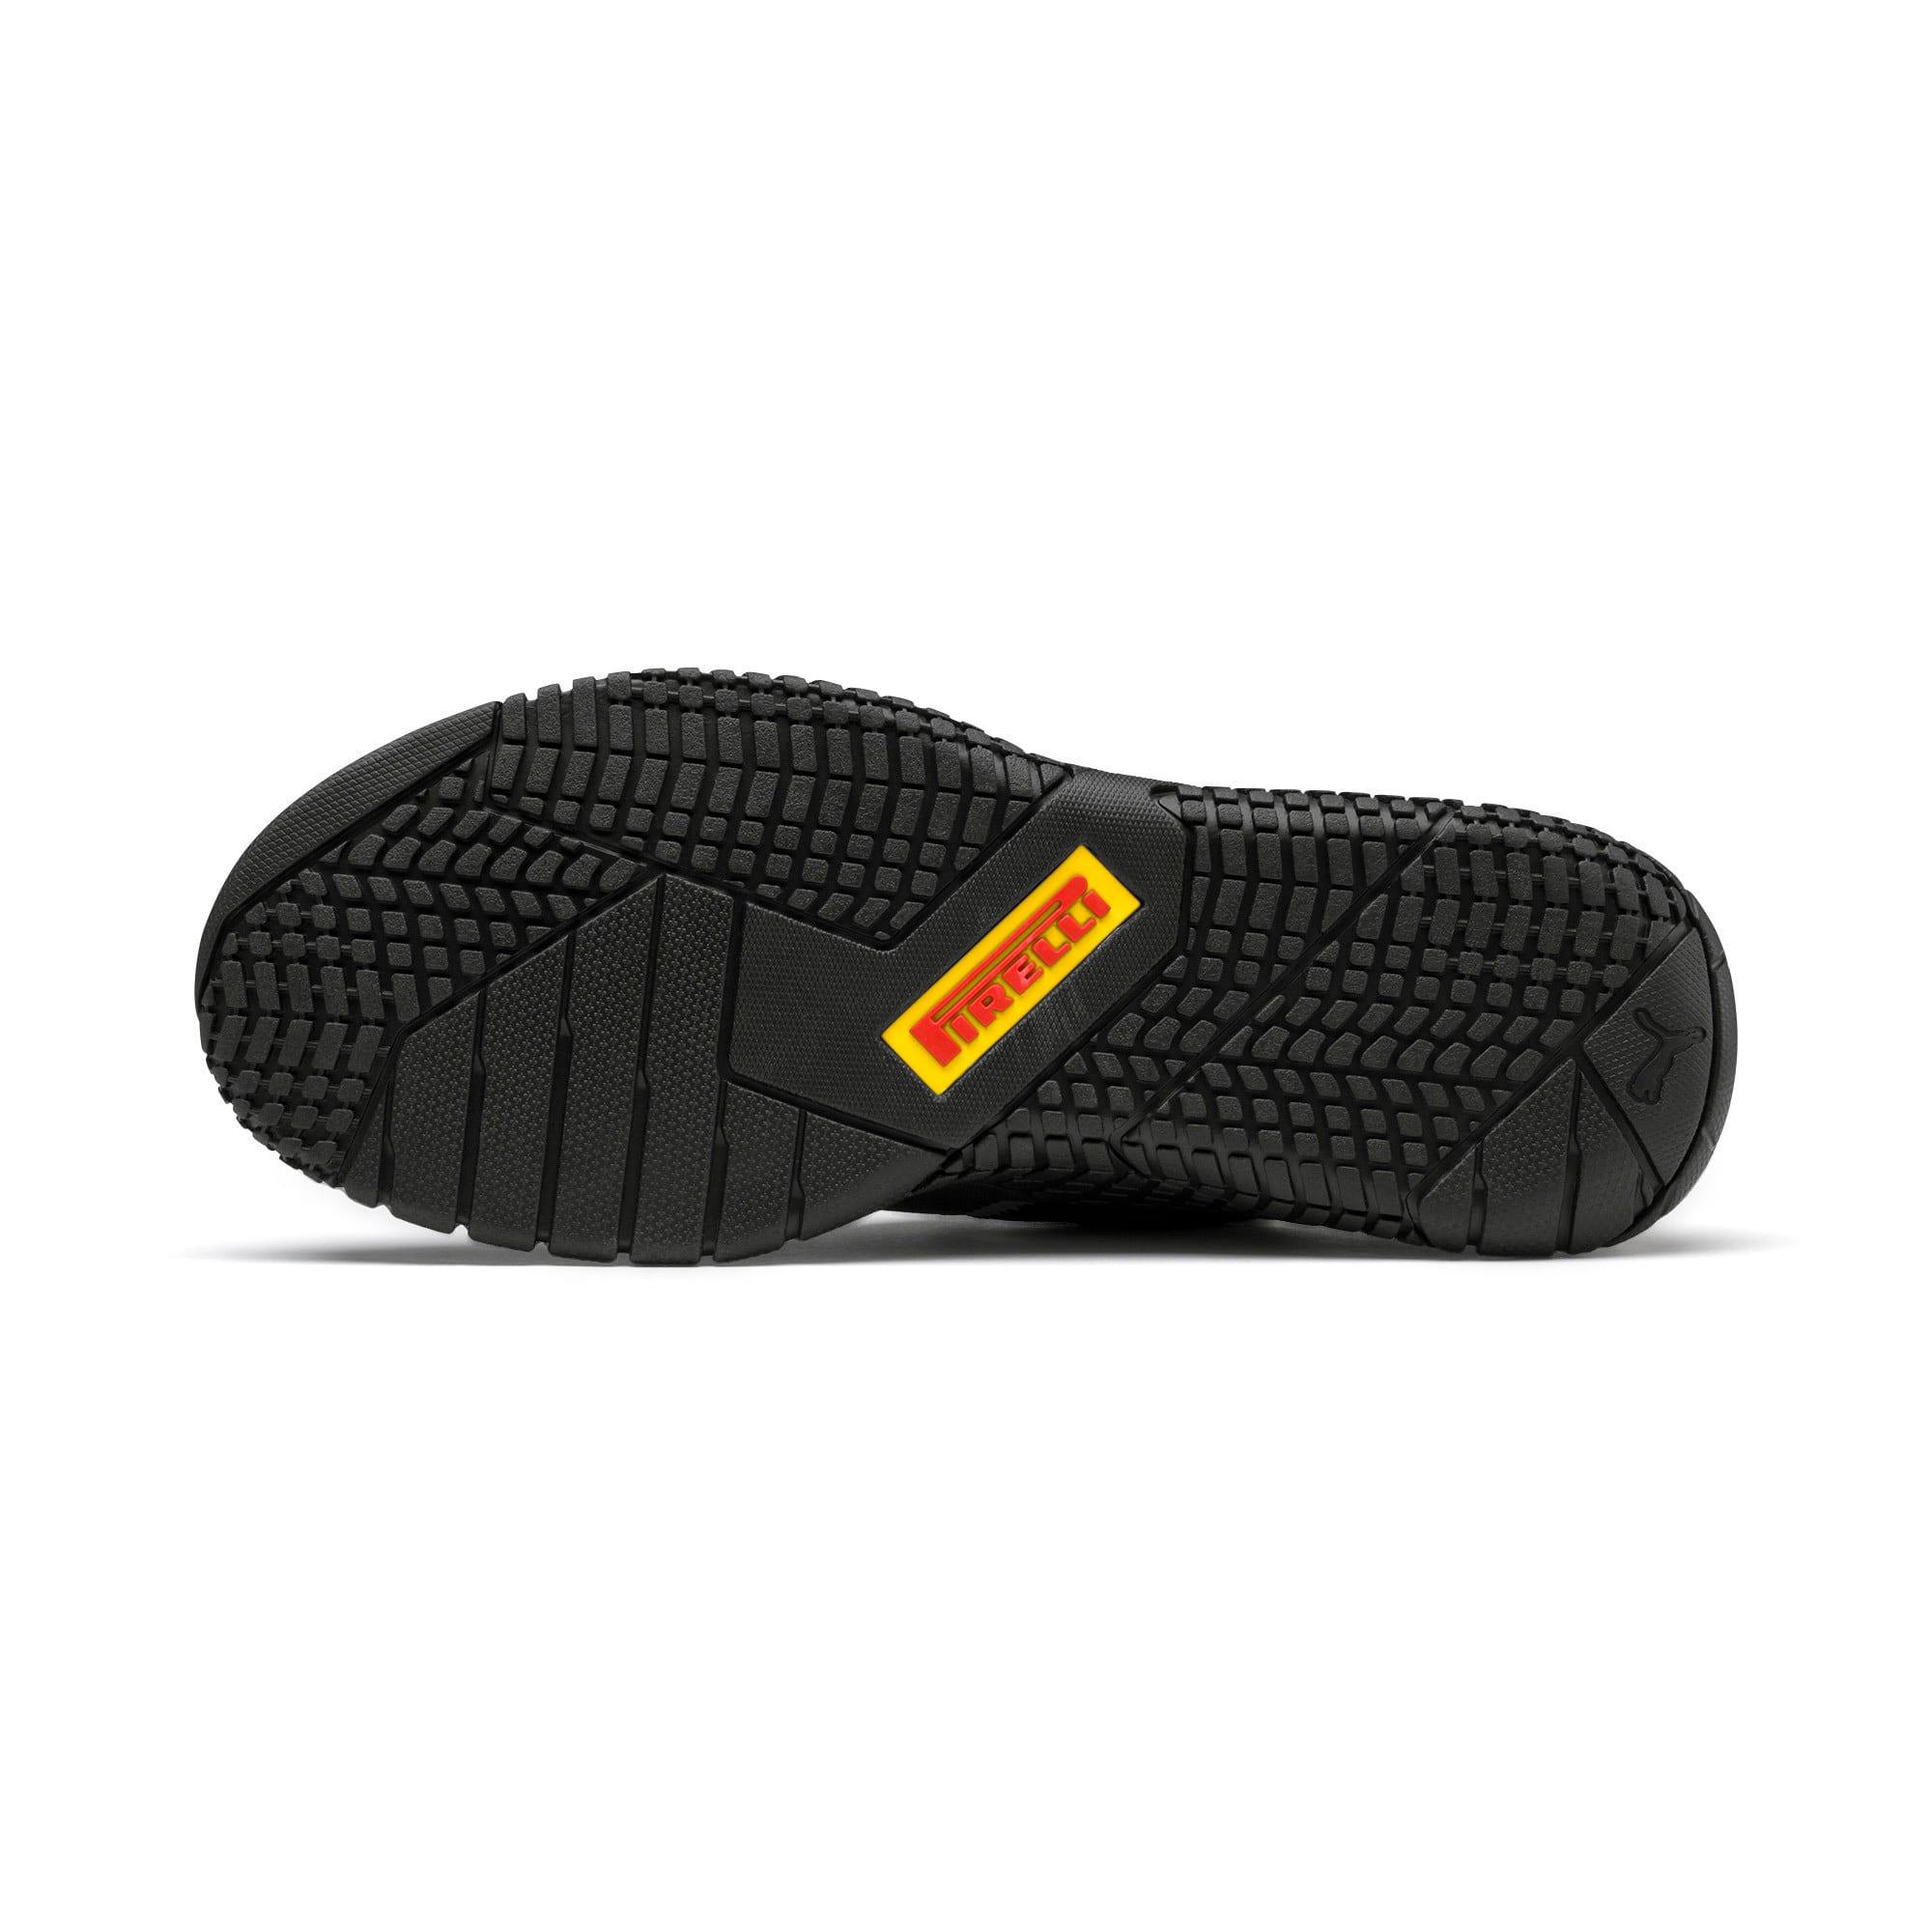 Thumbnail 4 of Pirelli Replicat-X Trainers, Black-Black-Cyber Yellow, medium